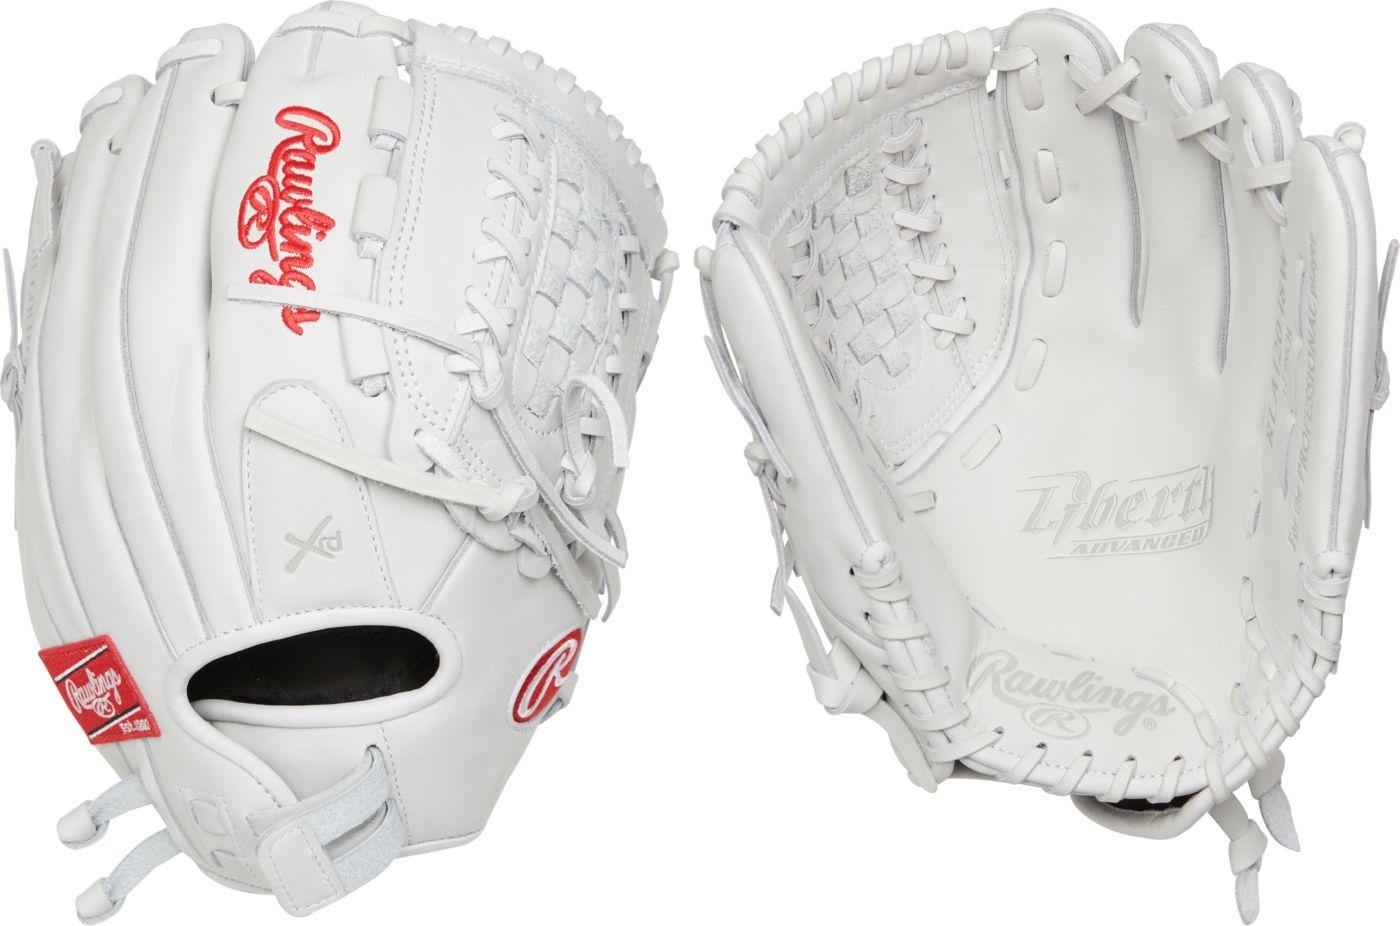 Rawlings 12'' Liberty Advanced Series Fastpitch Glove